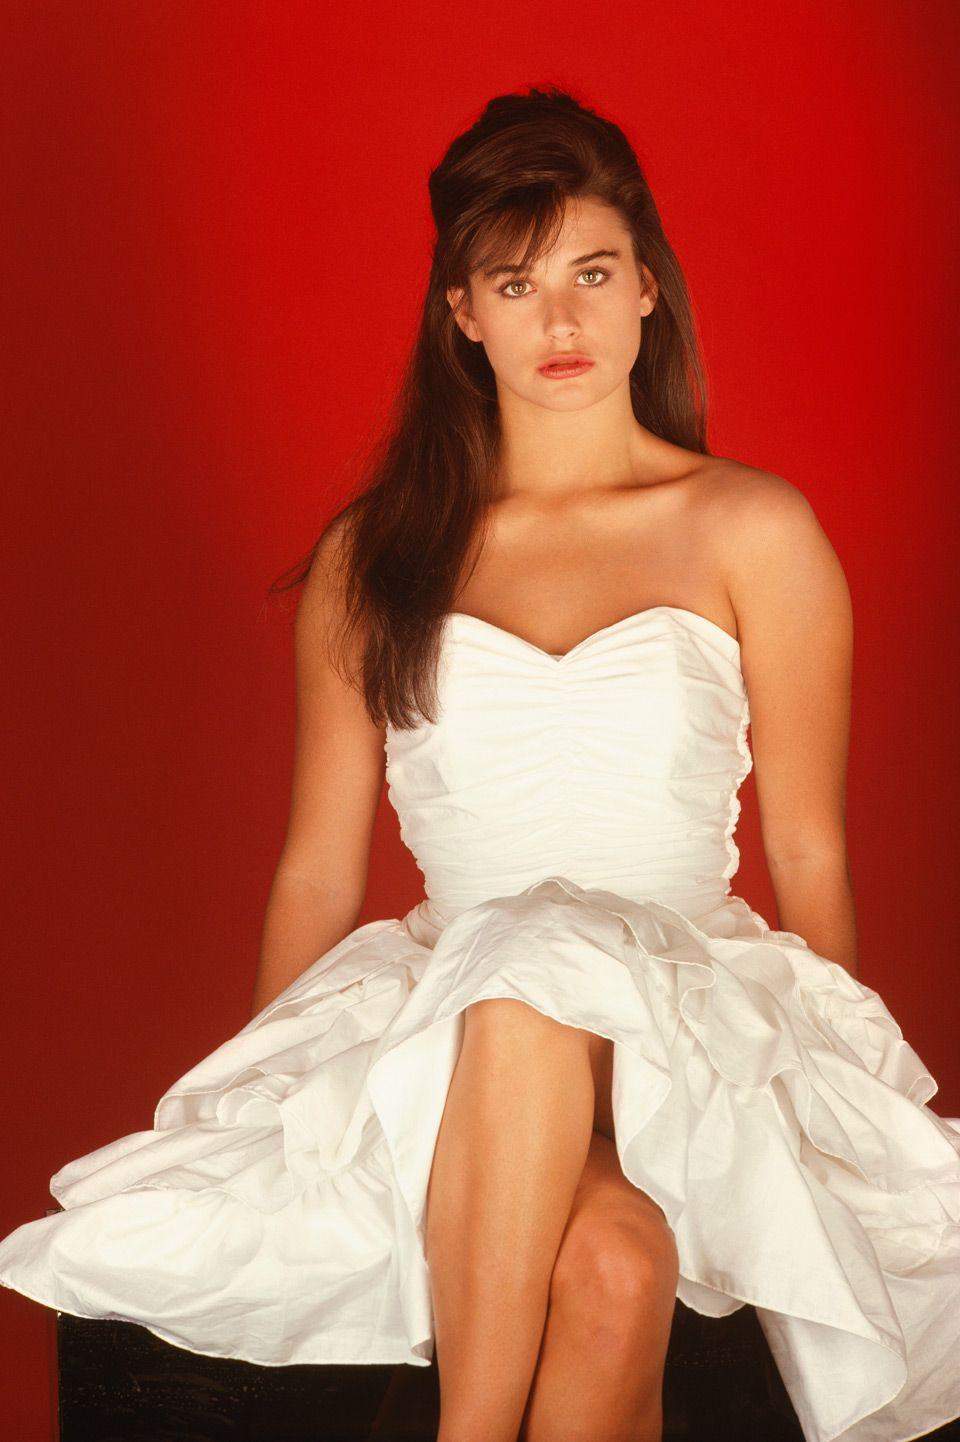 1984 год. 22-летняя Дэми. Фото: R.Shoshana